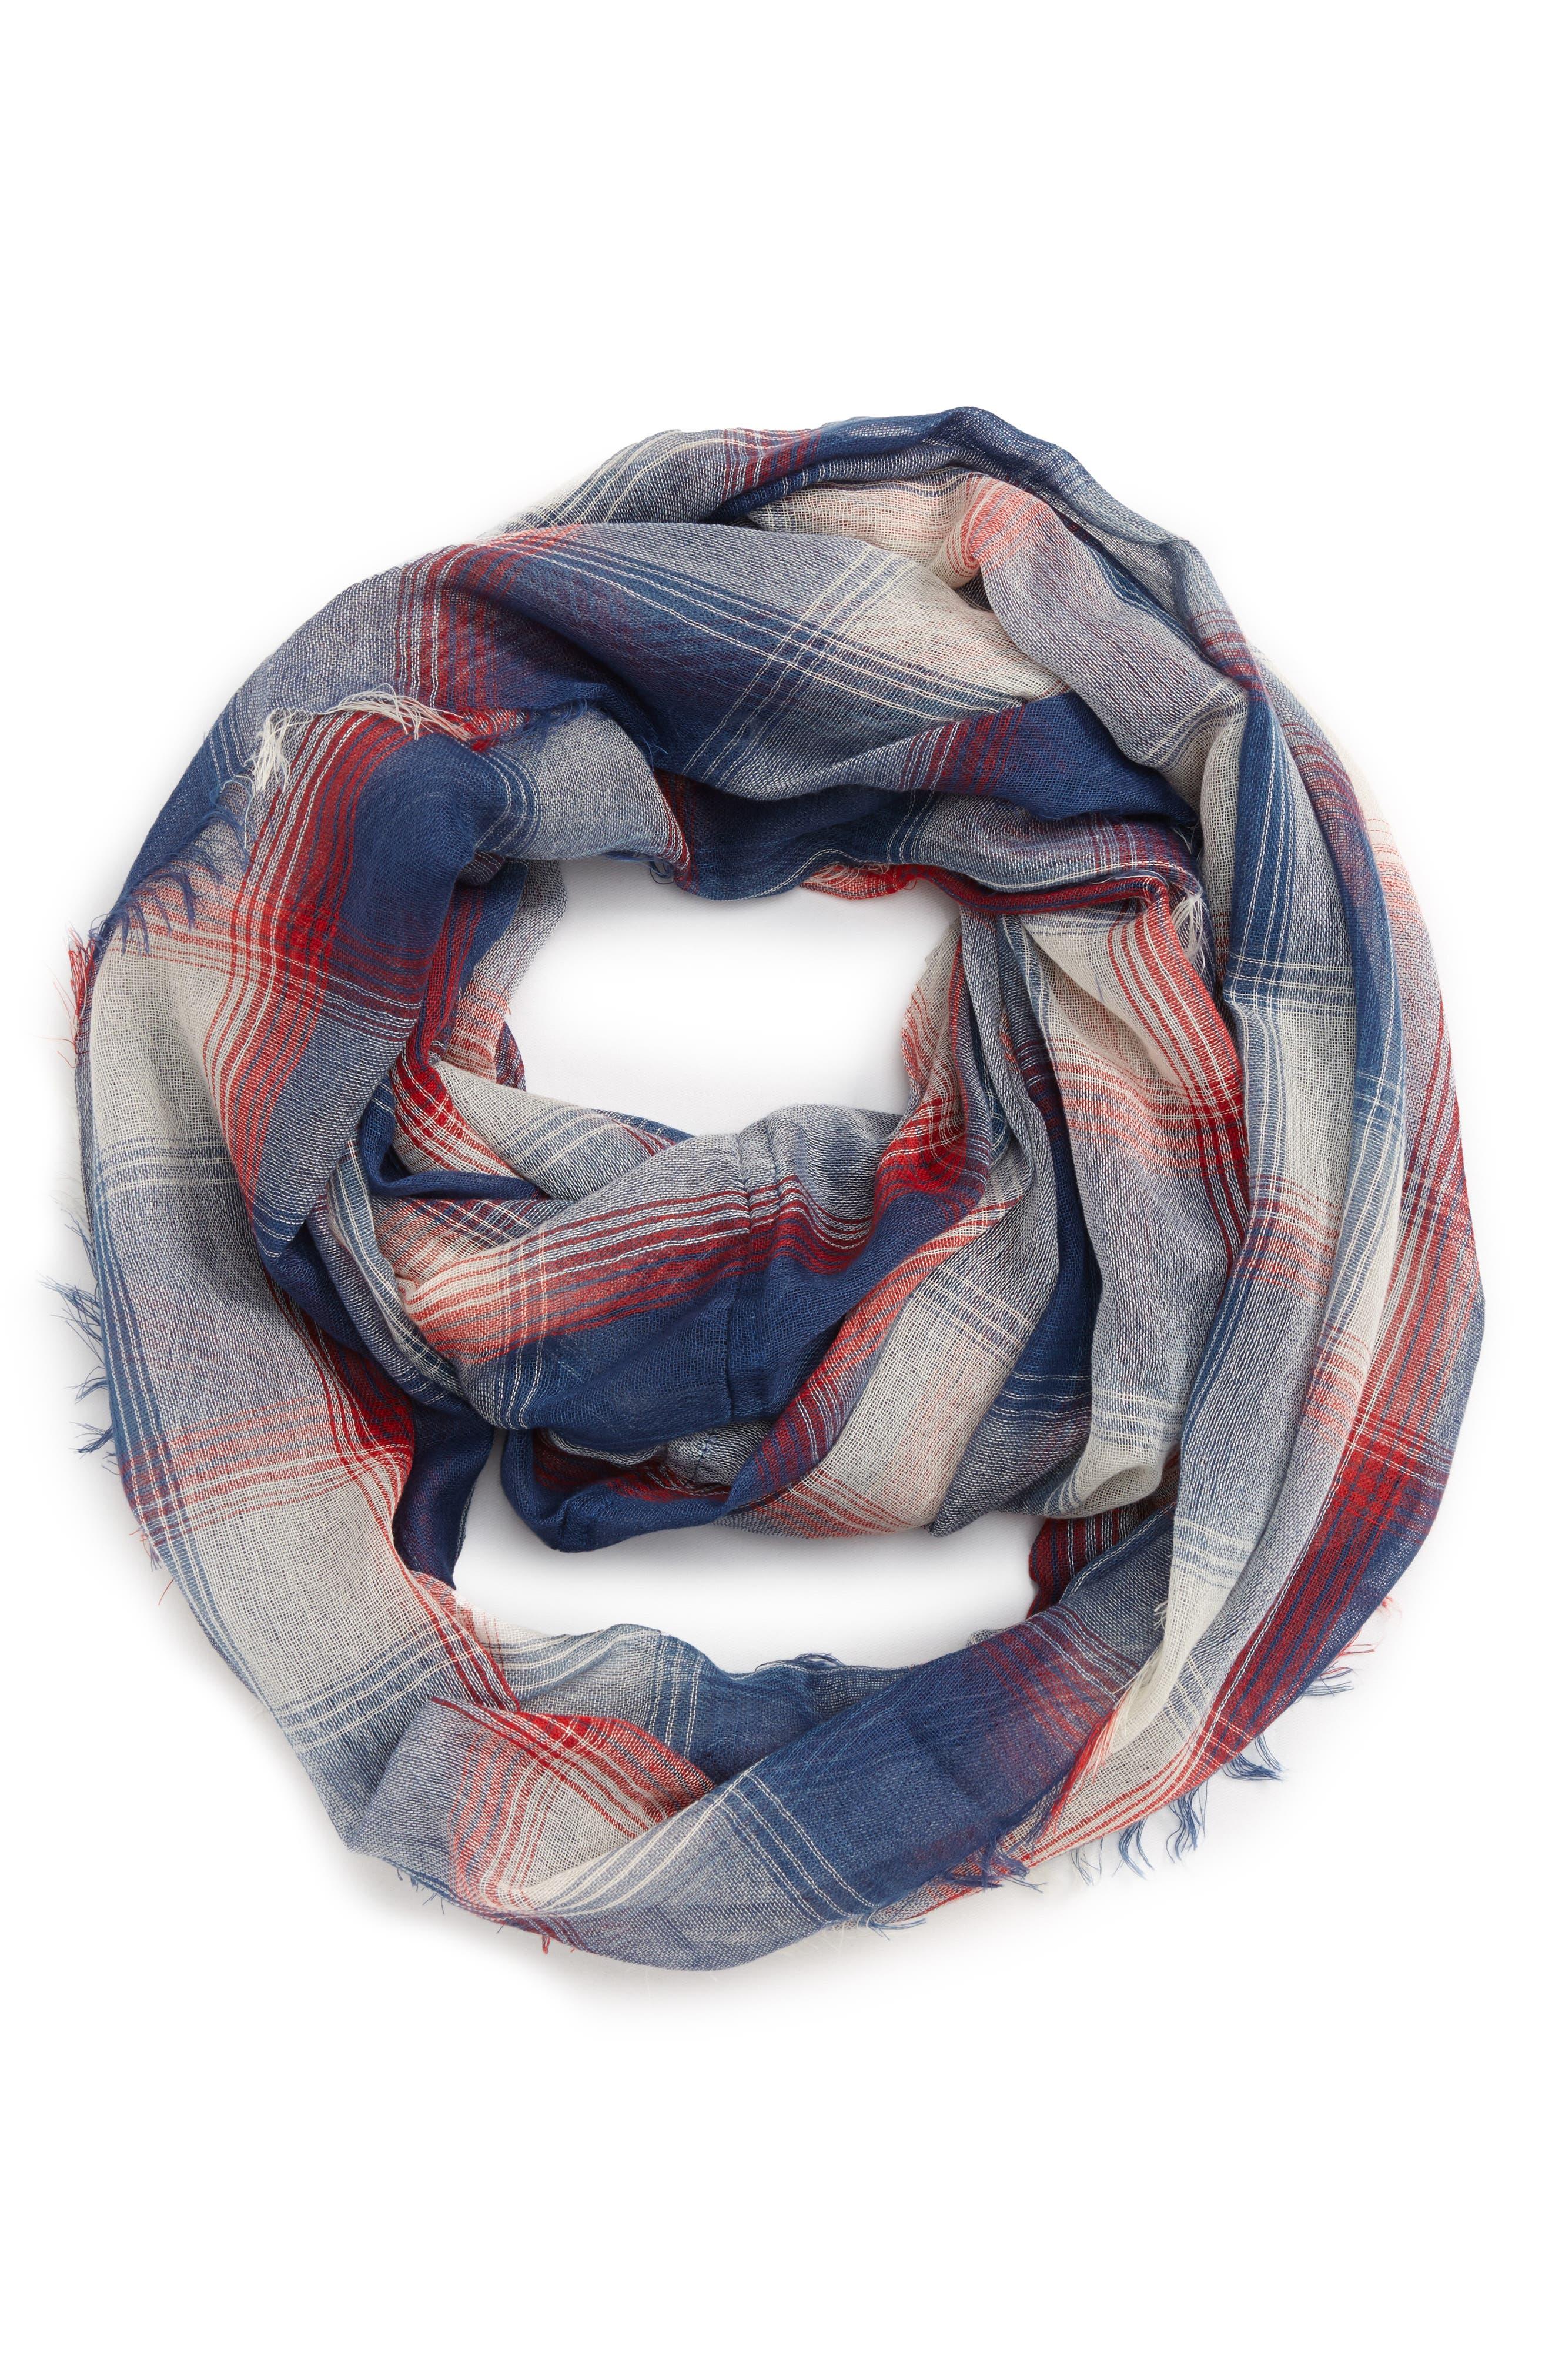 Infinity scarf fashion trend Wholesale Scarves UK, Fashion Costume Jewellery